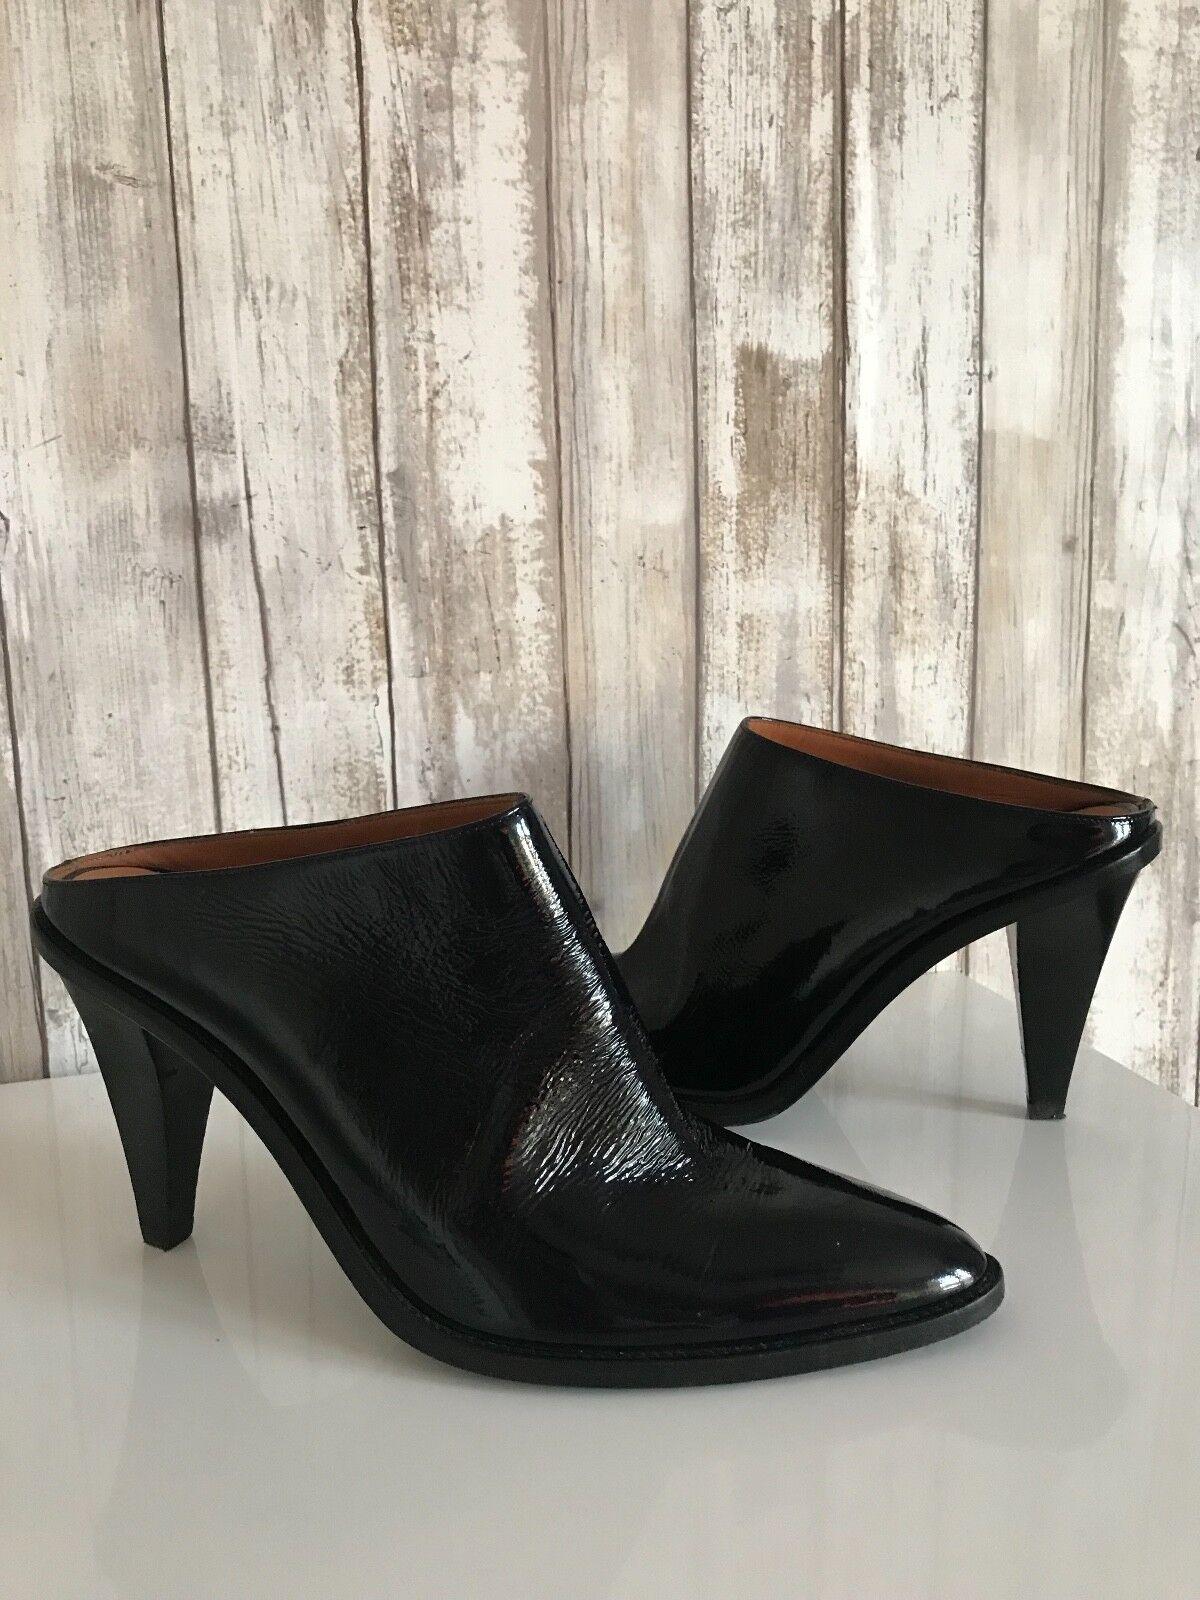 H&M Studio Collection 2014 Black Patent Leather Mule Slides Slip On Heels 40 8.5